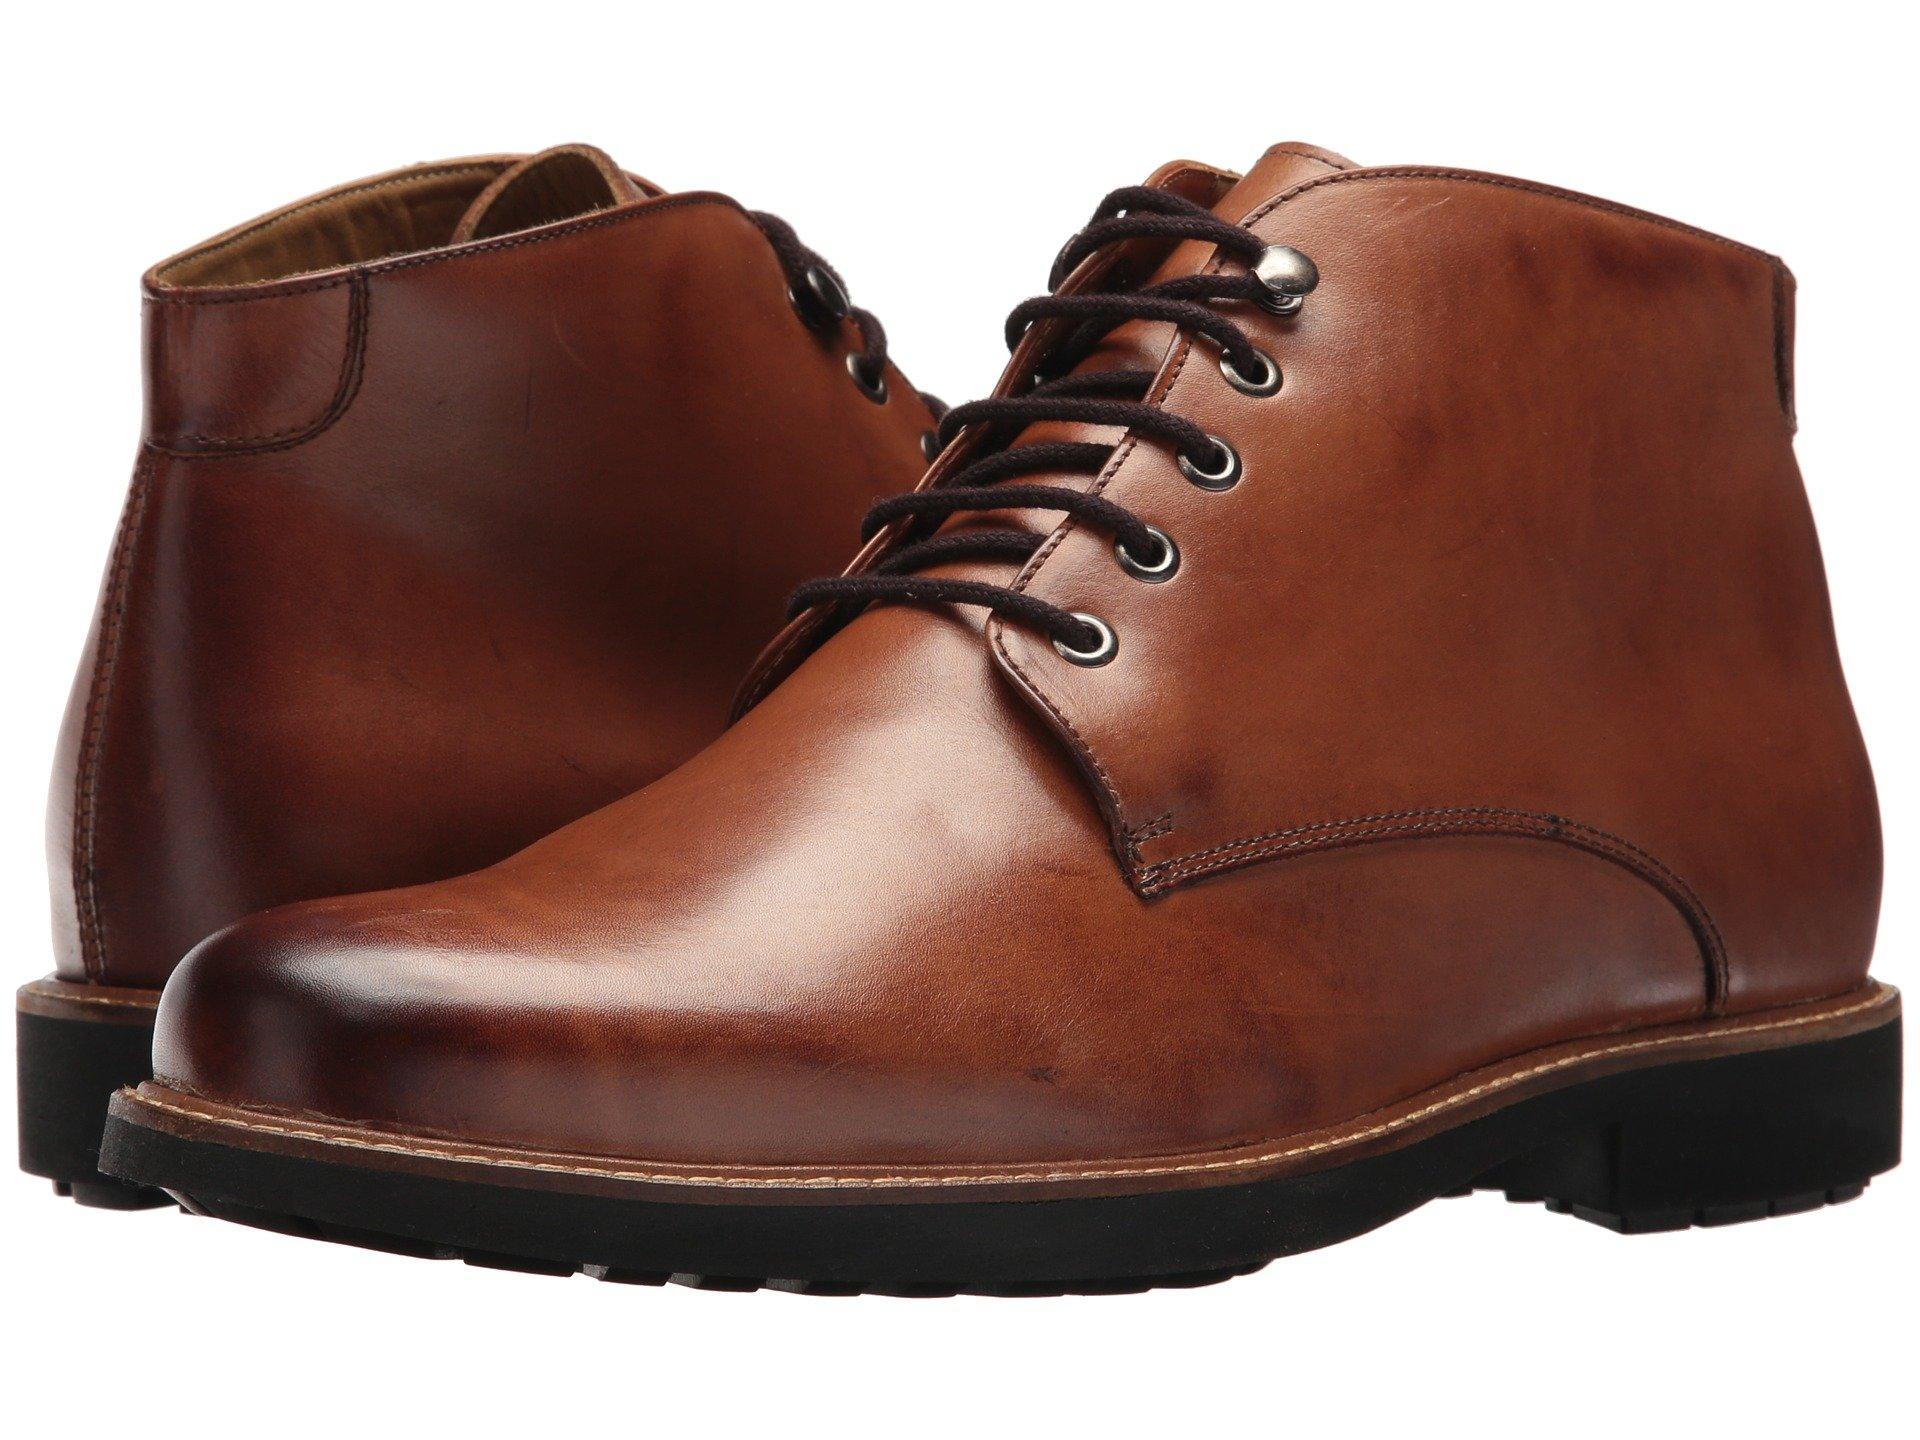 TC-3-Massimo-Mens-Boots-2017-12-5